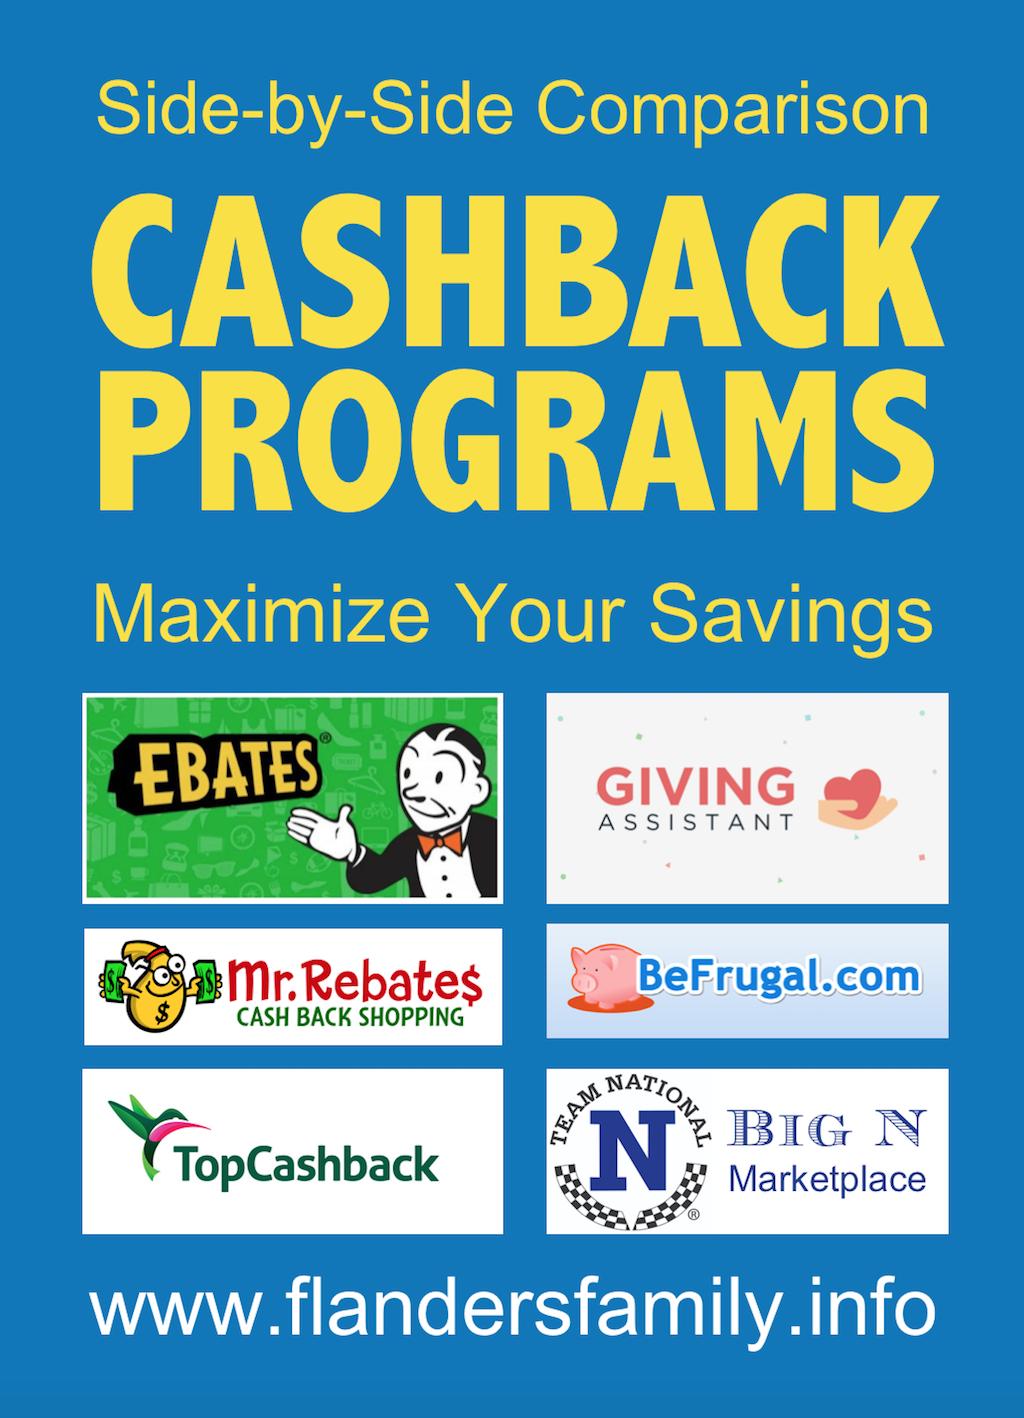 Cashback Program Comparison